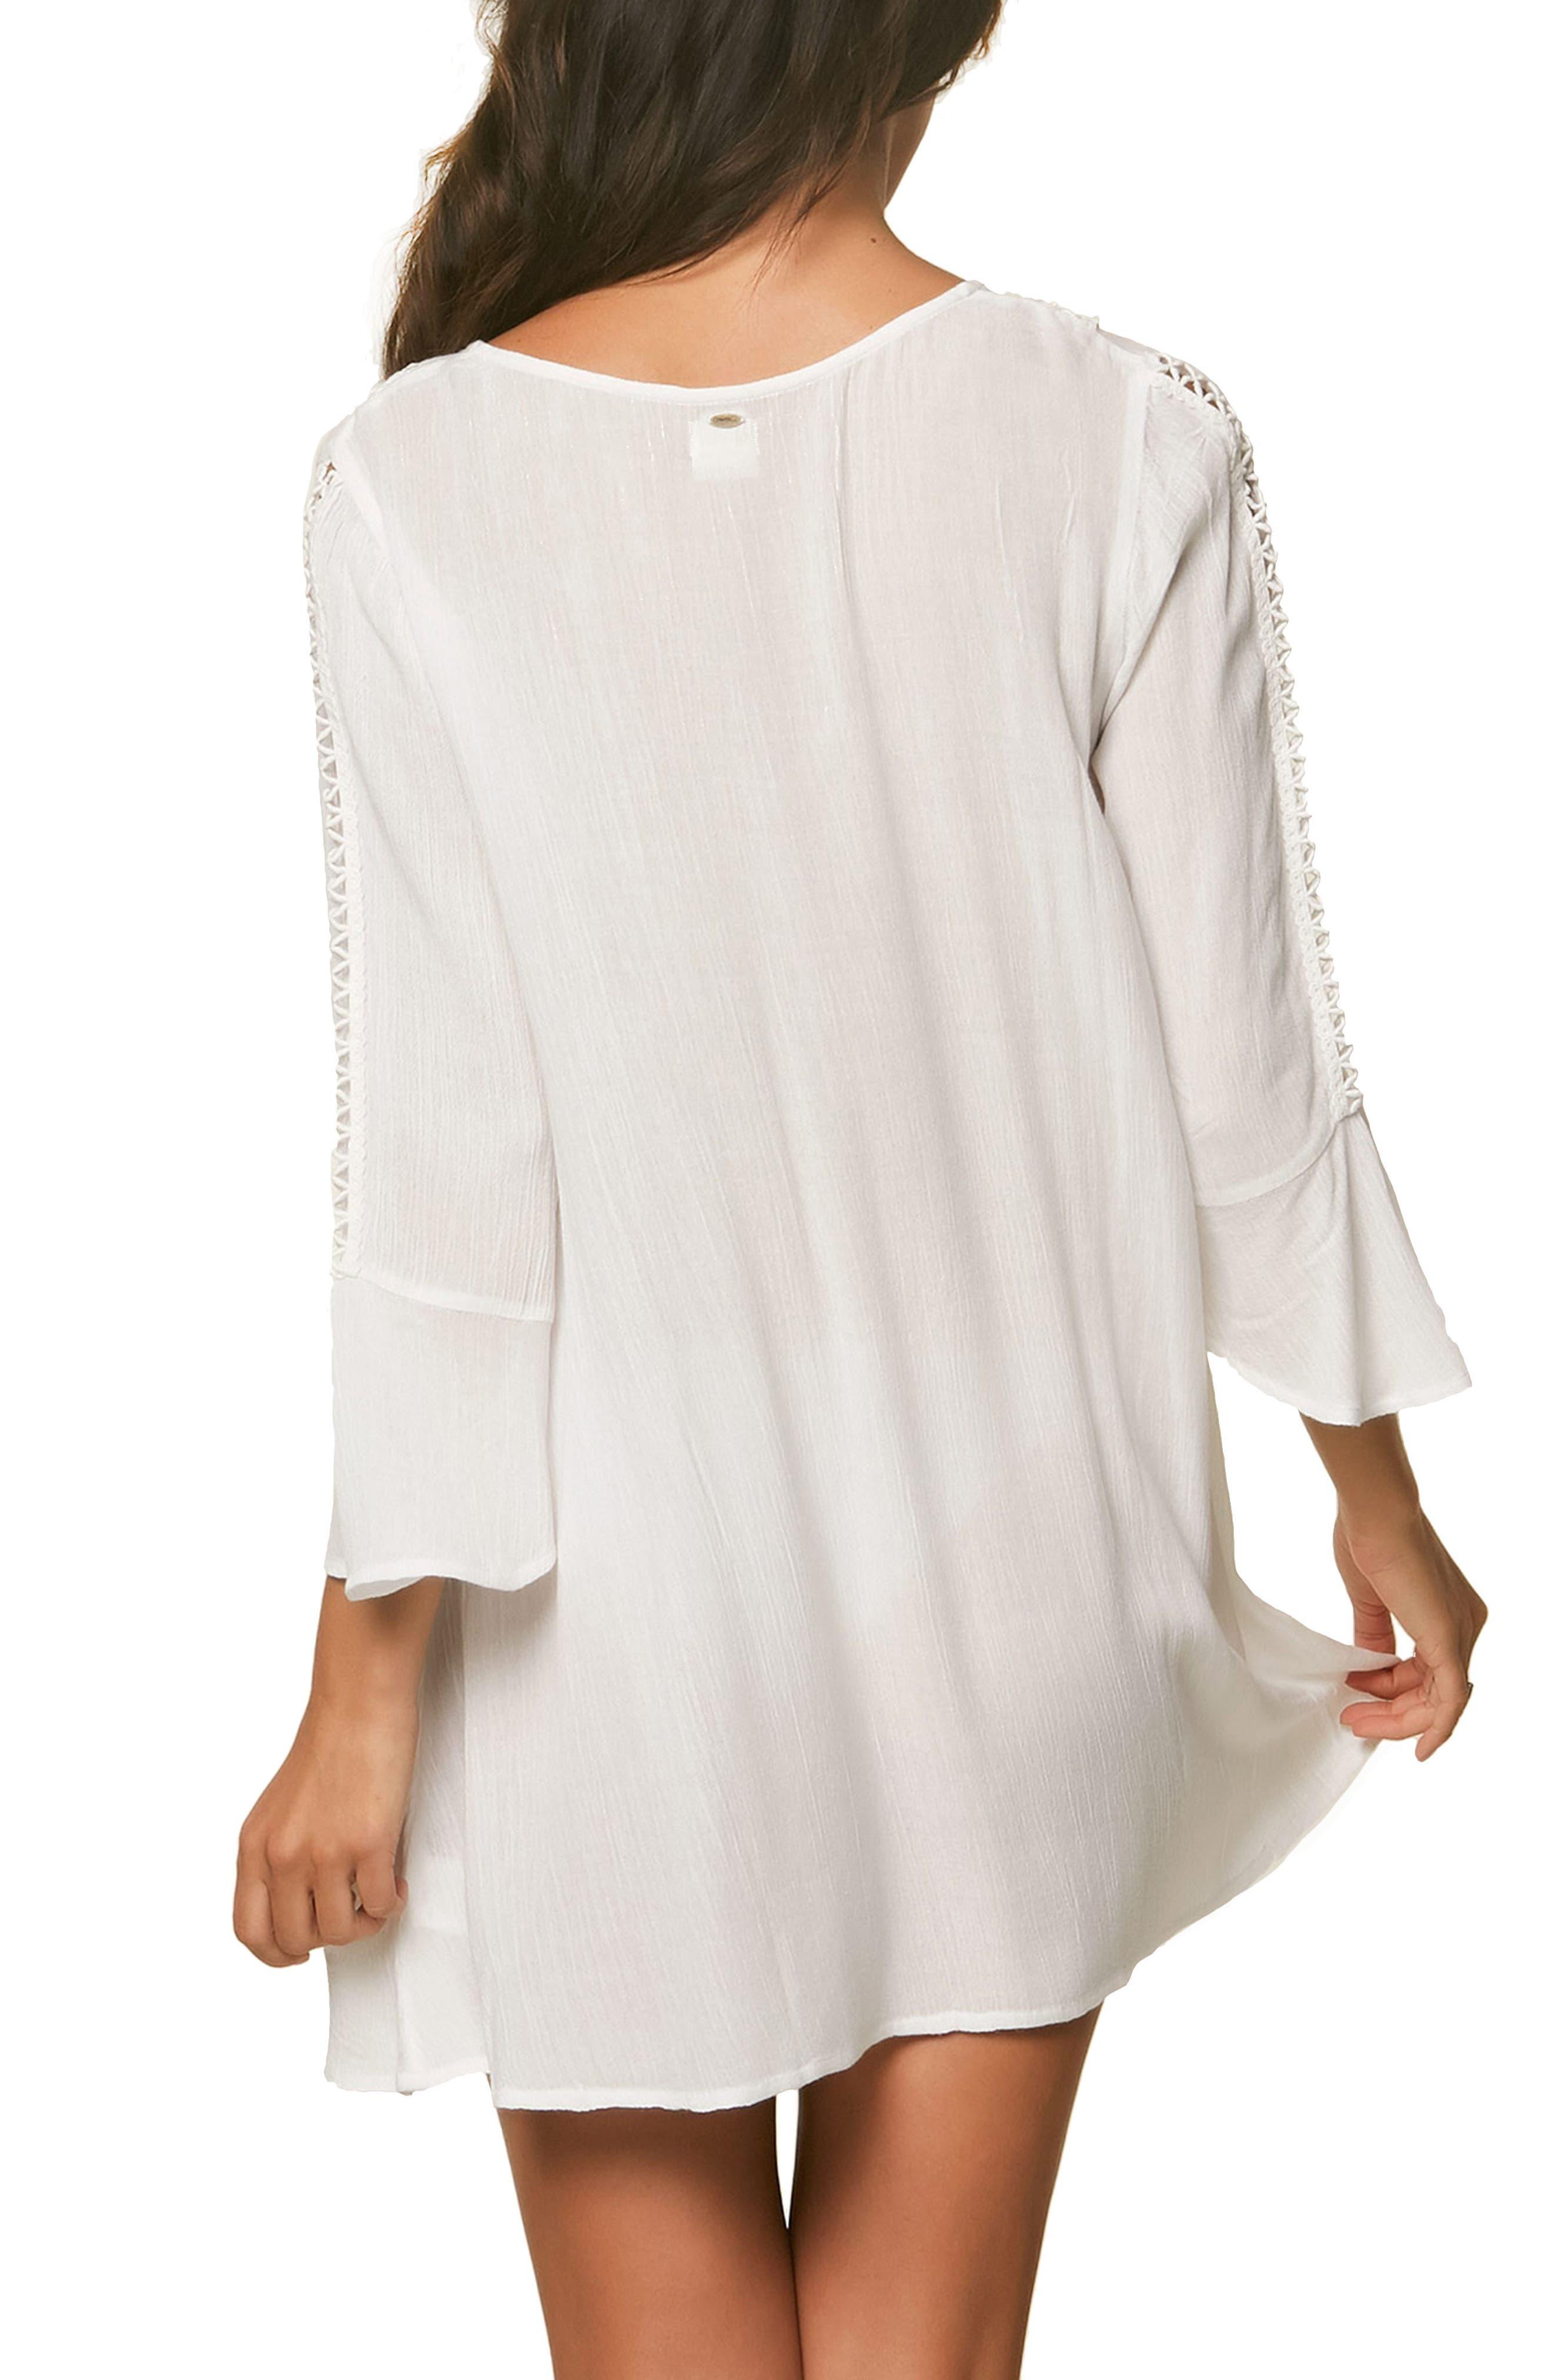 Estella Cover-up Dress,                             Alternate thumbnail 2, color,                             White